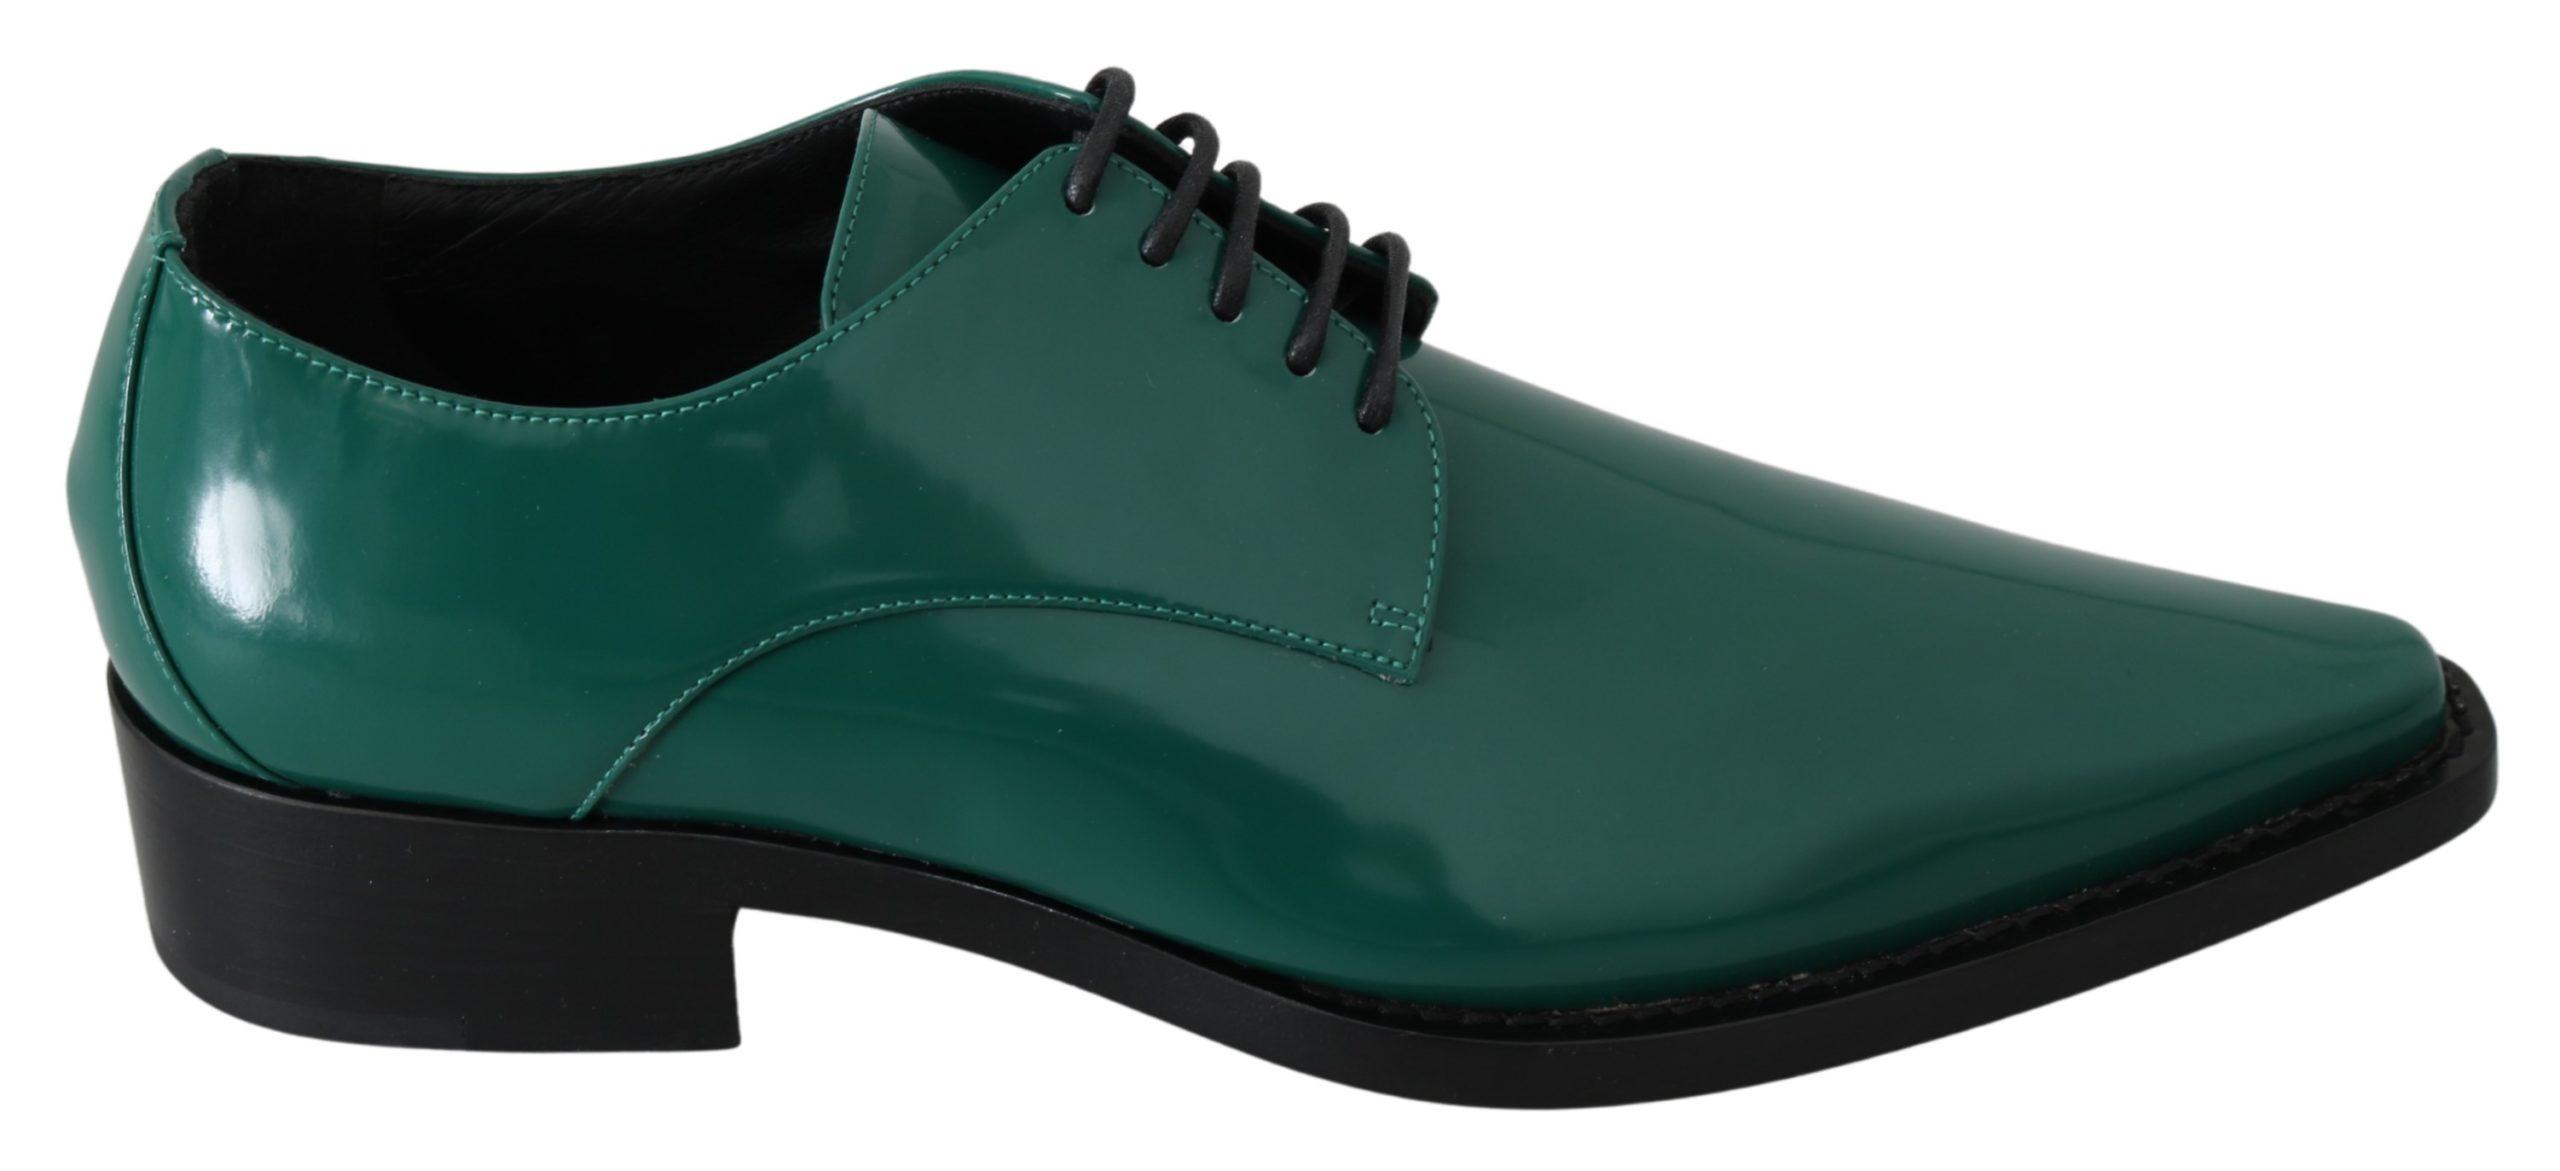 Dolce & Gabbana Women's Leather Formal Dress Broque Shoe Green LA7211 - EU38/US7.5